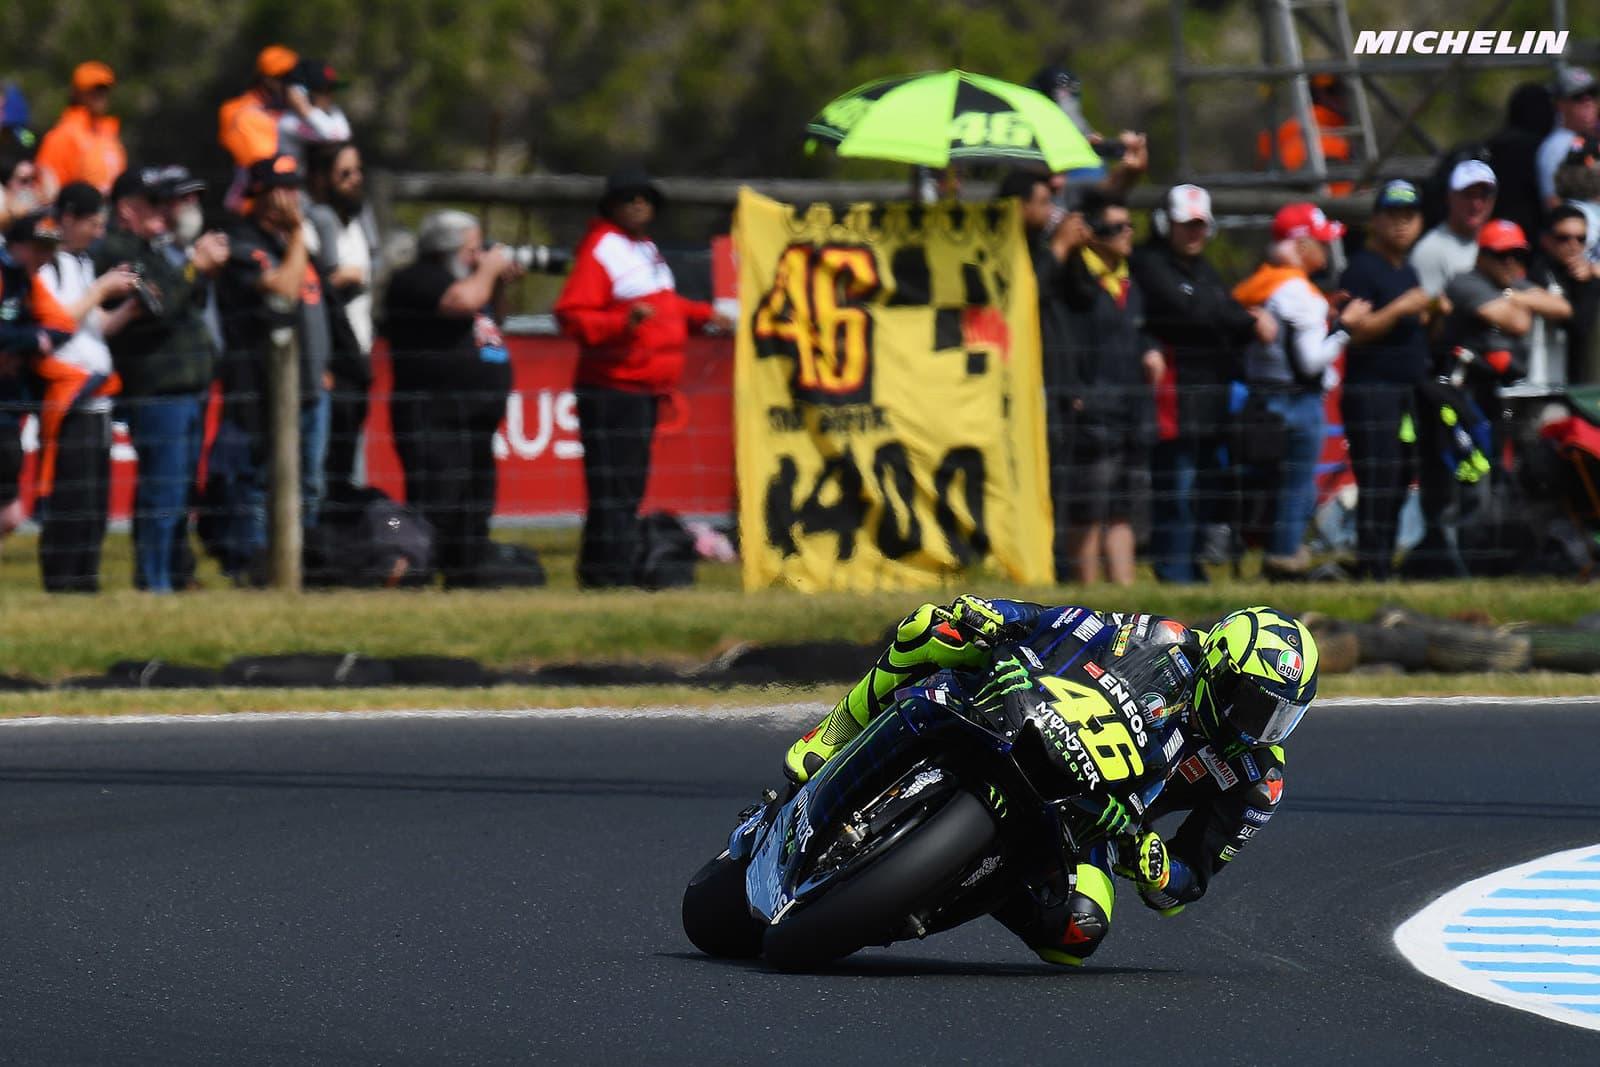 MotoGP2019オーストラリアGP 8位ロッシ「今までよりも良いライディングが出来ていた」